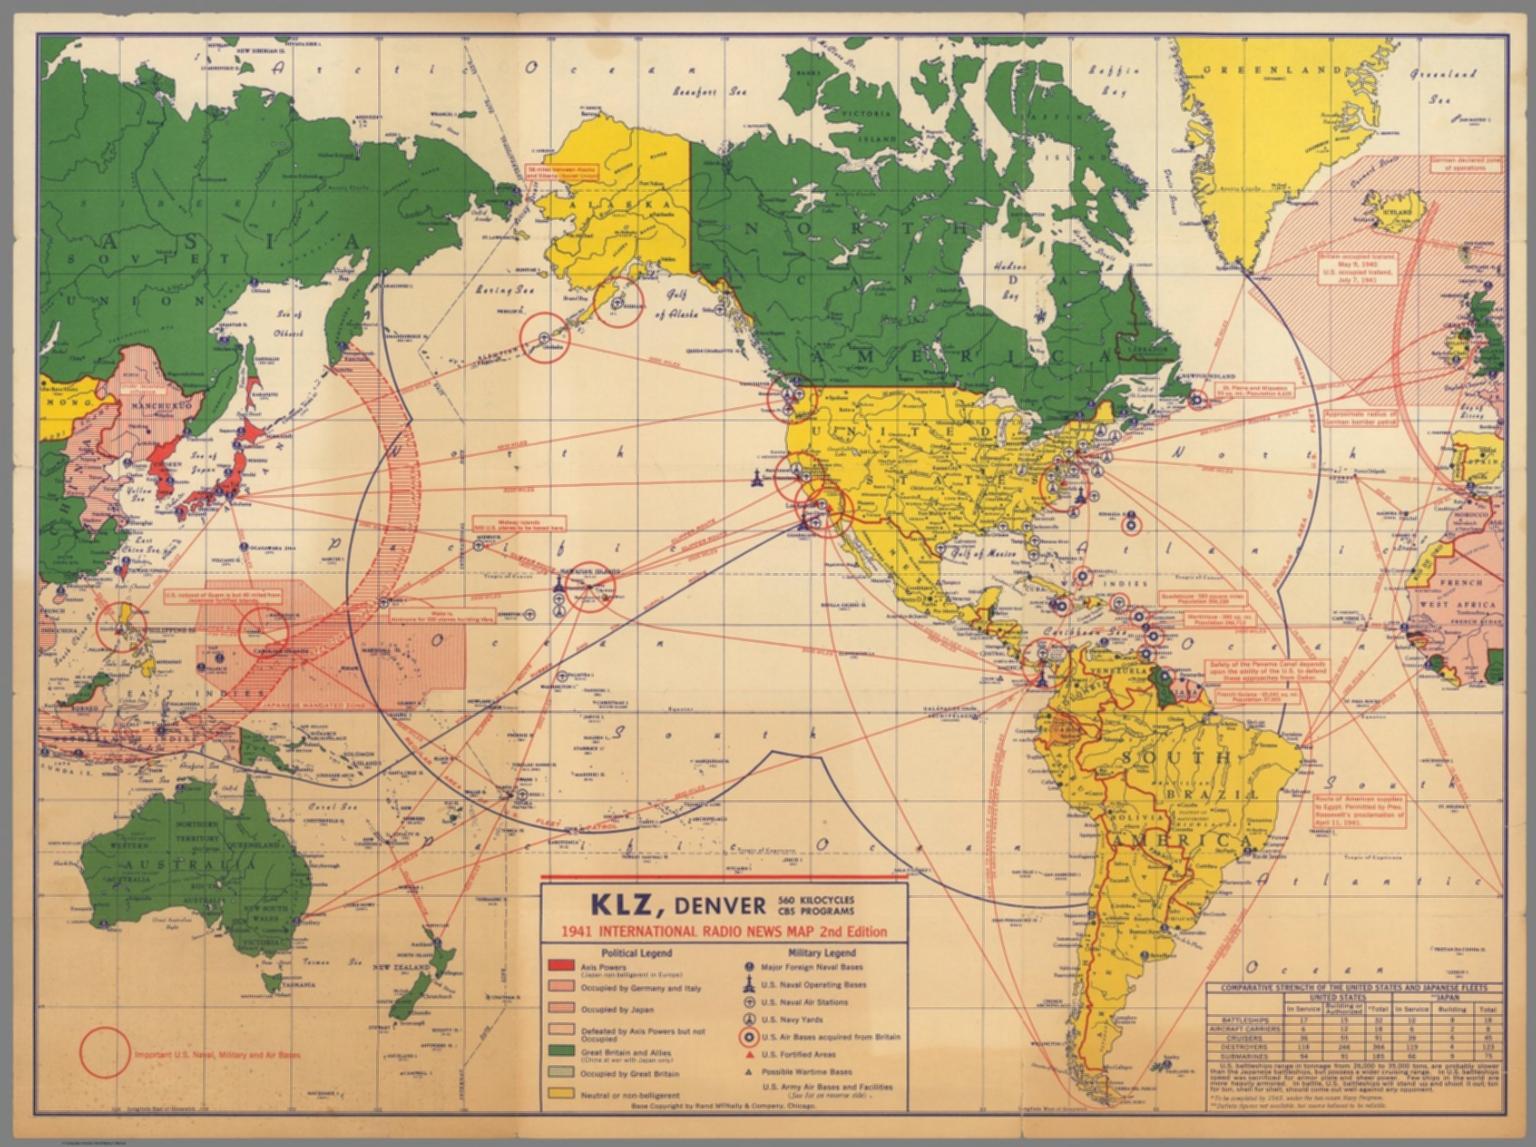 Denver World Map.Klz Denver 1941 International Radio News Map Second Edition